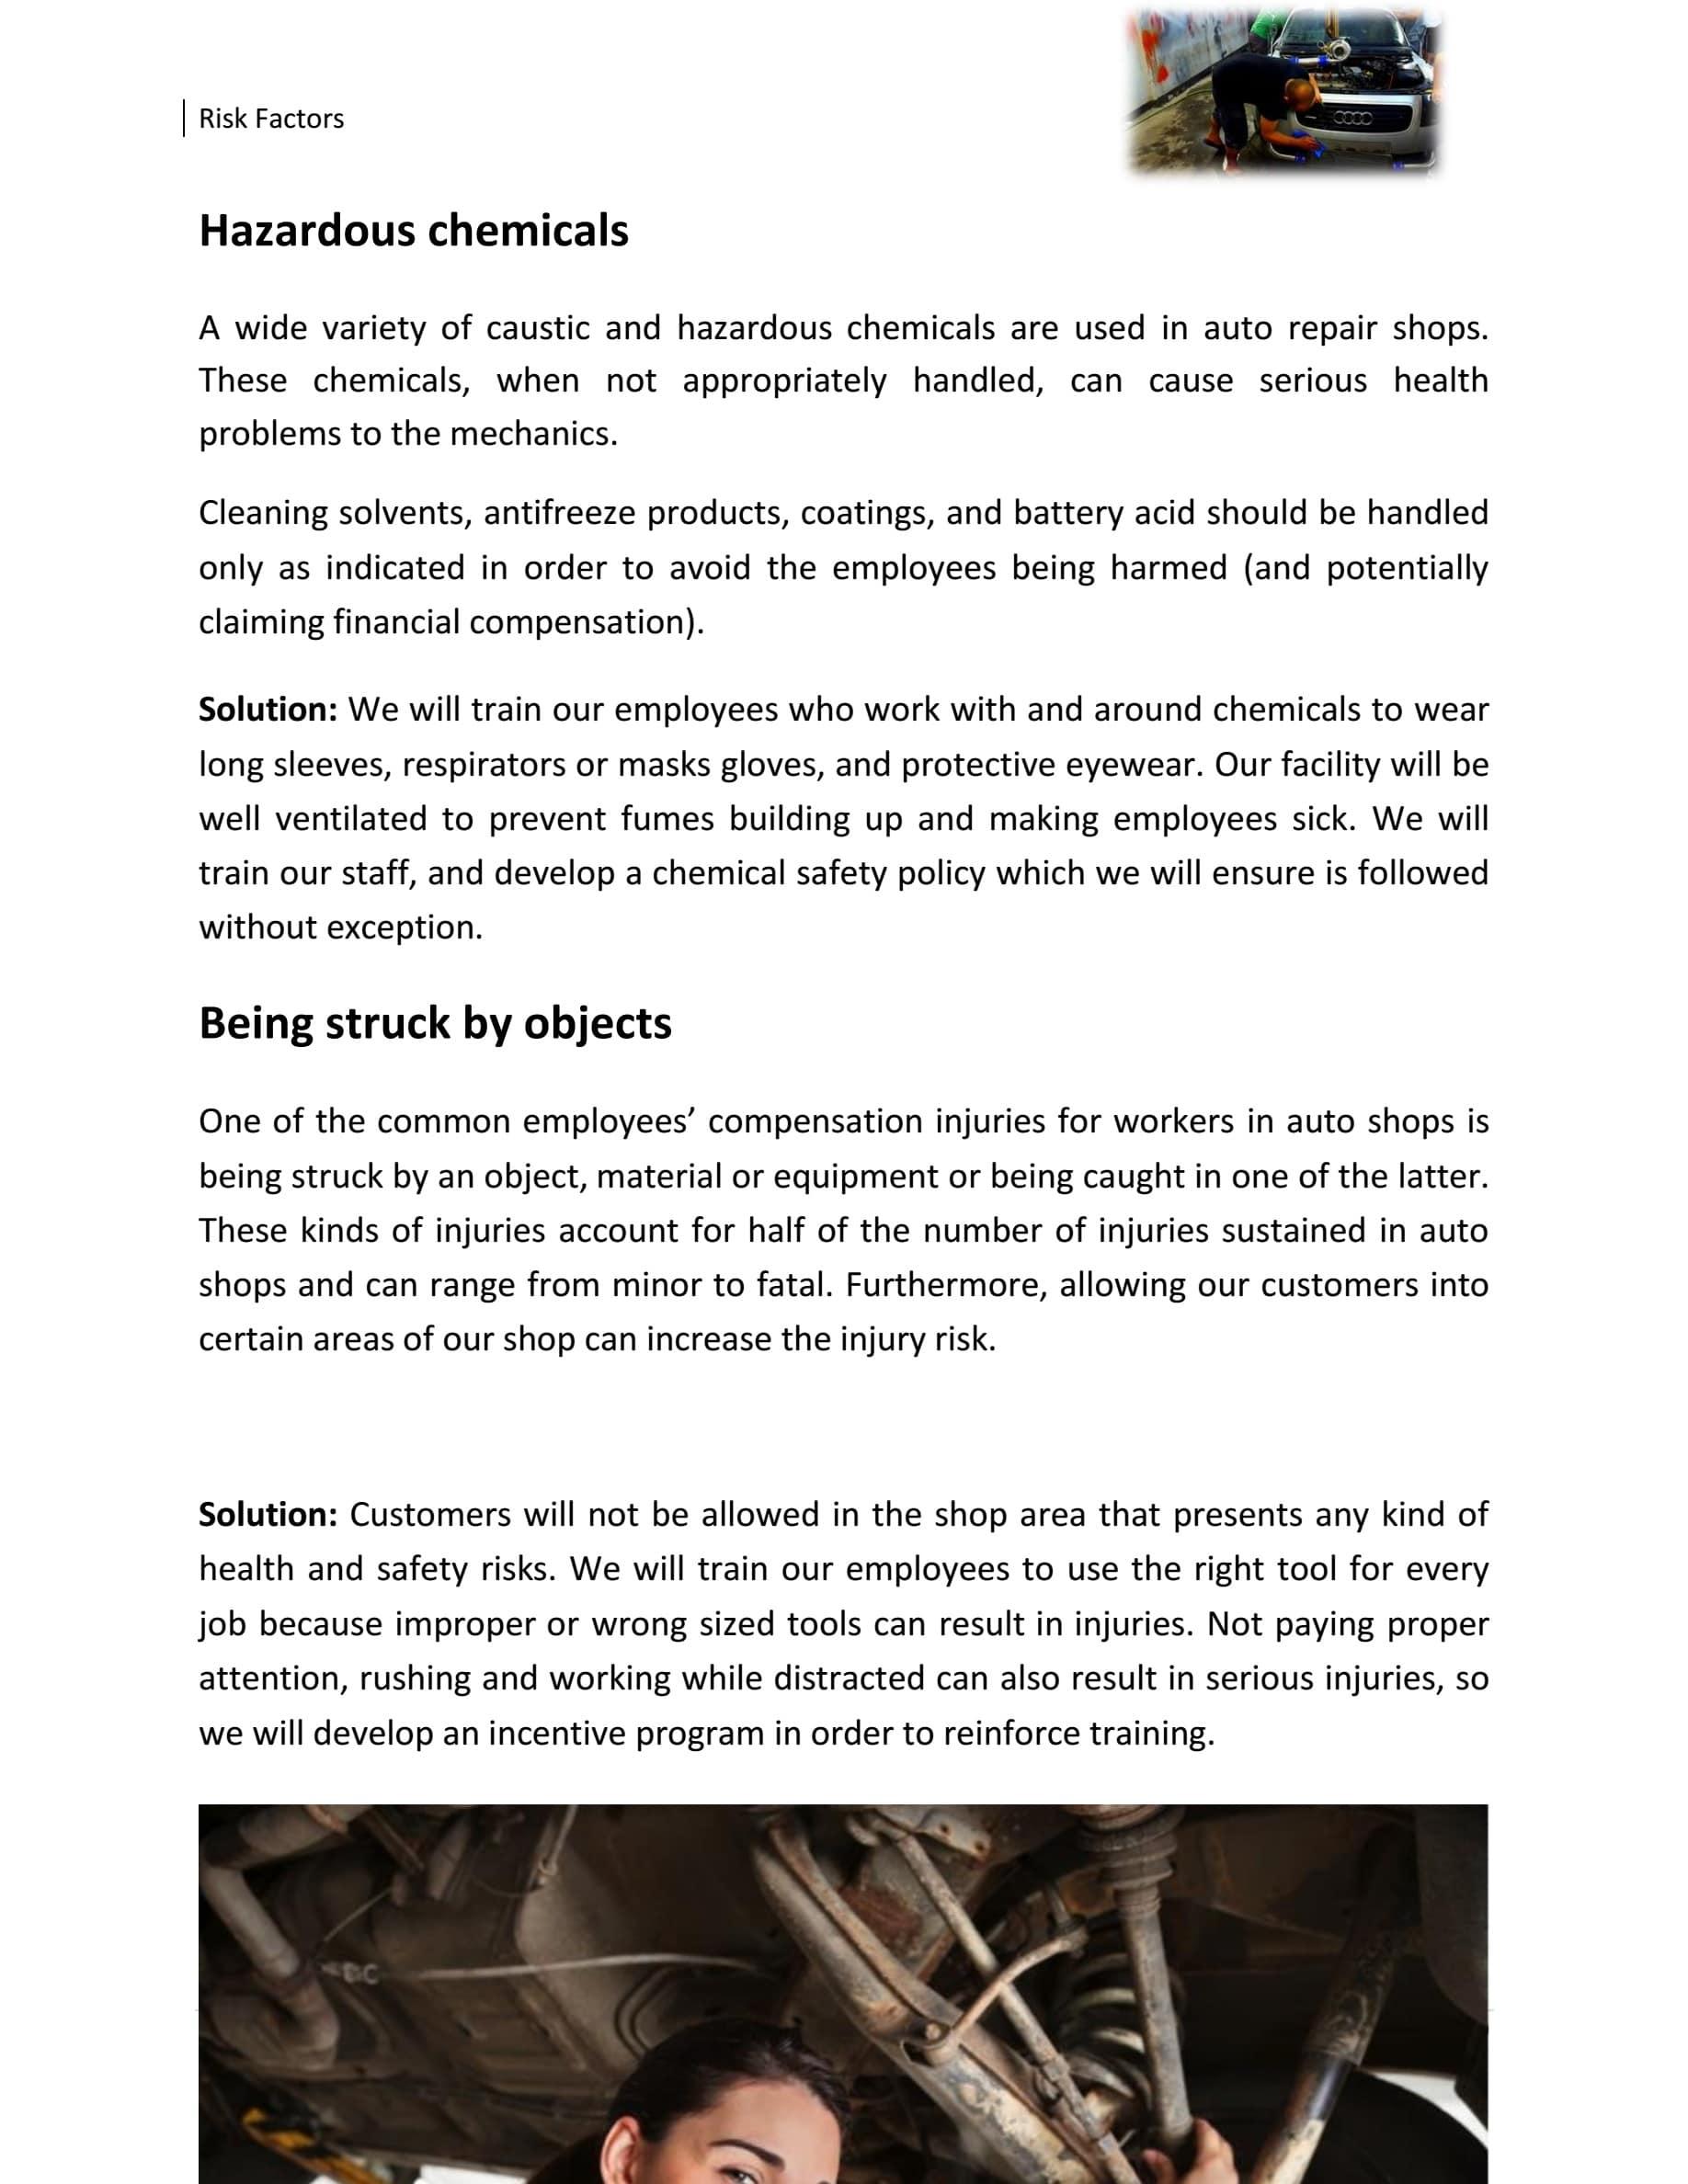 autobody business plan